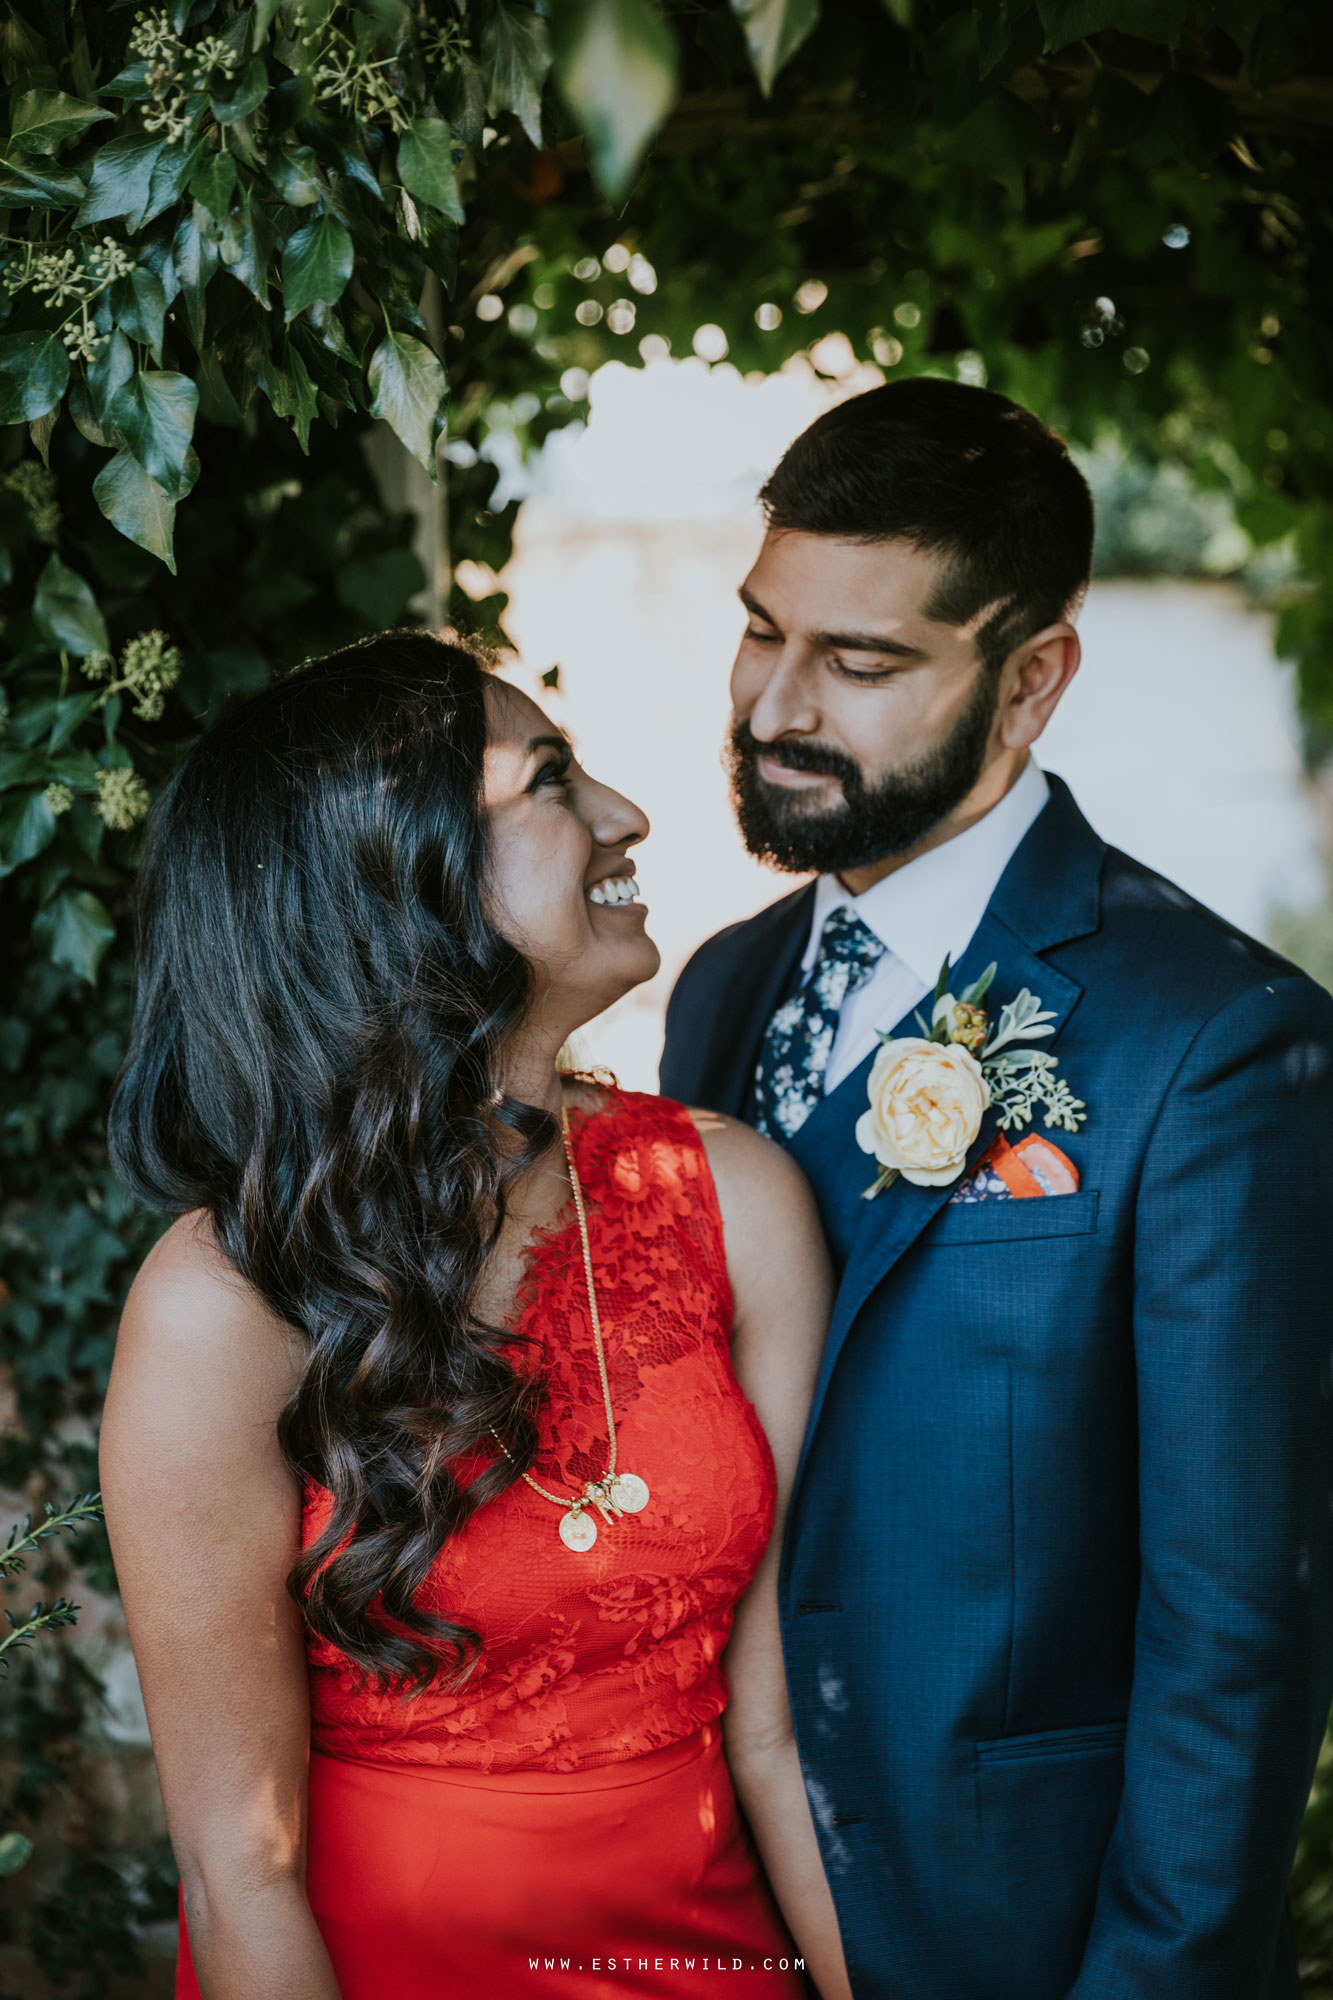 Northbrook_Park_Farnham_Surrey_London_Wedding_Hindu_Fusion_Esther_Wild_Photographer_IMG_5478.jpg